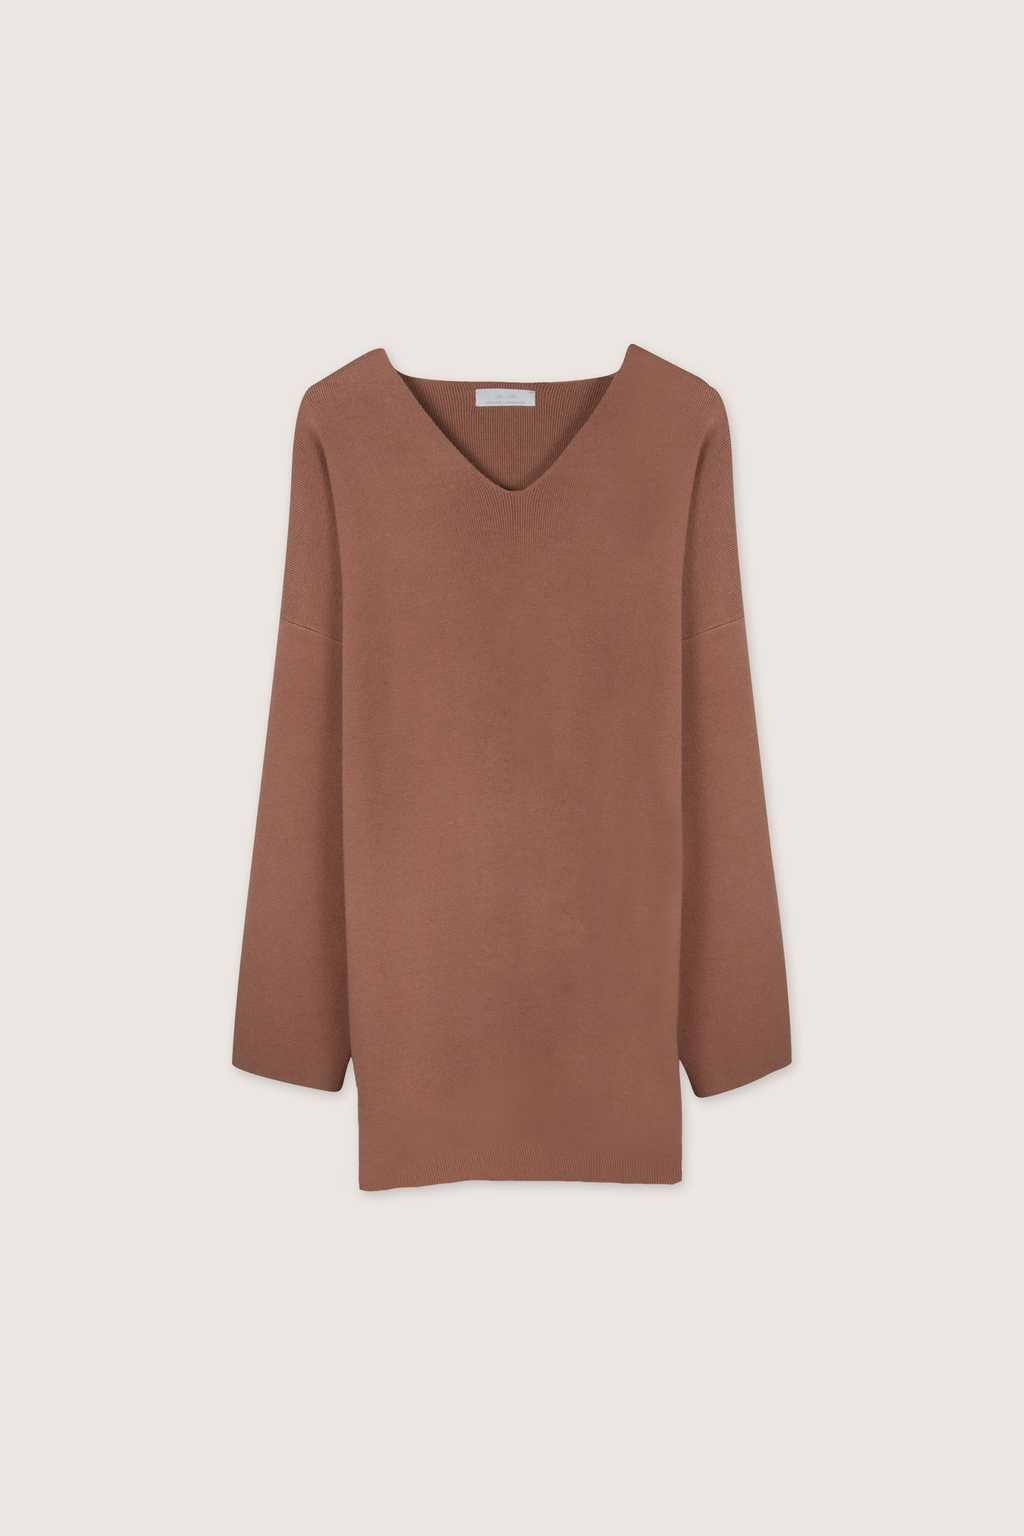 Sweater 1747 Pink 7